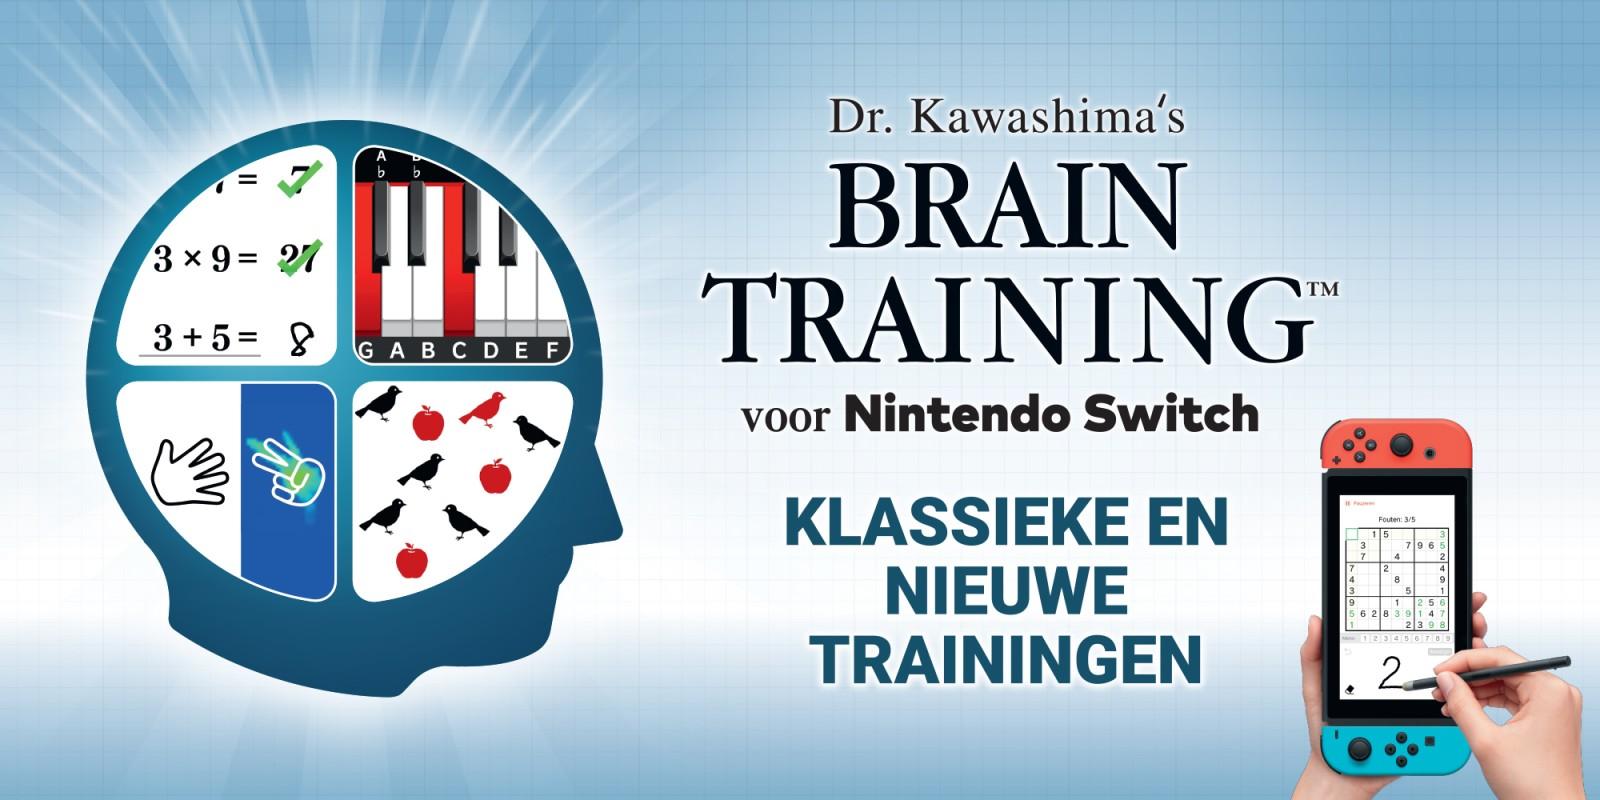 Je dagelijkse portie Braintraining met Dr. Kawashima